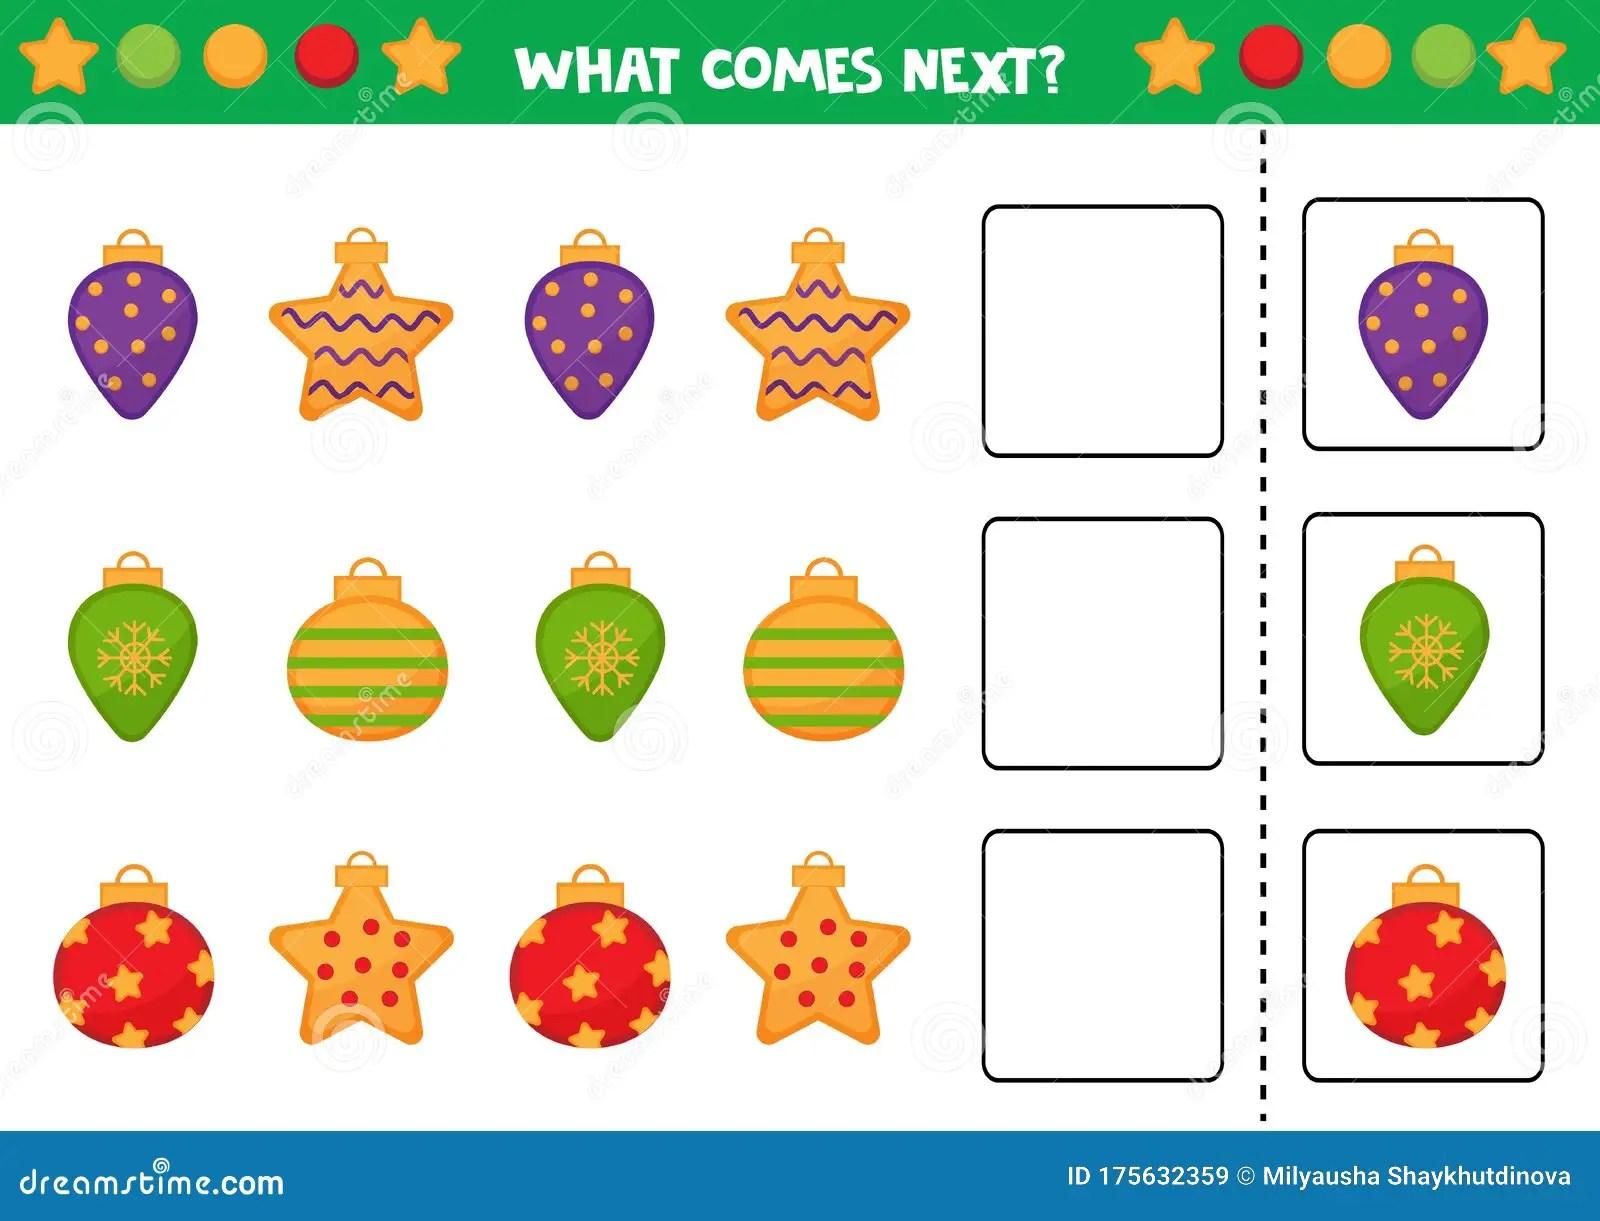 Educational Worksheet For Kids Games For Kids Printable